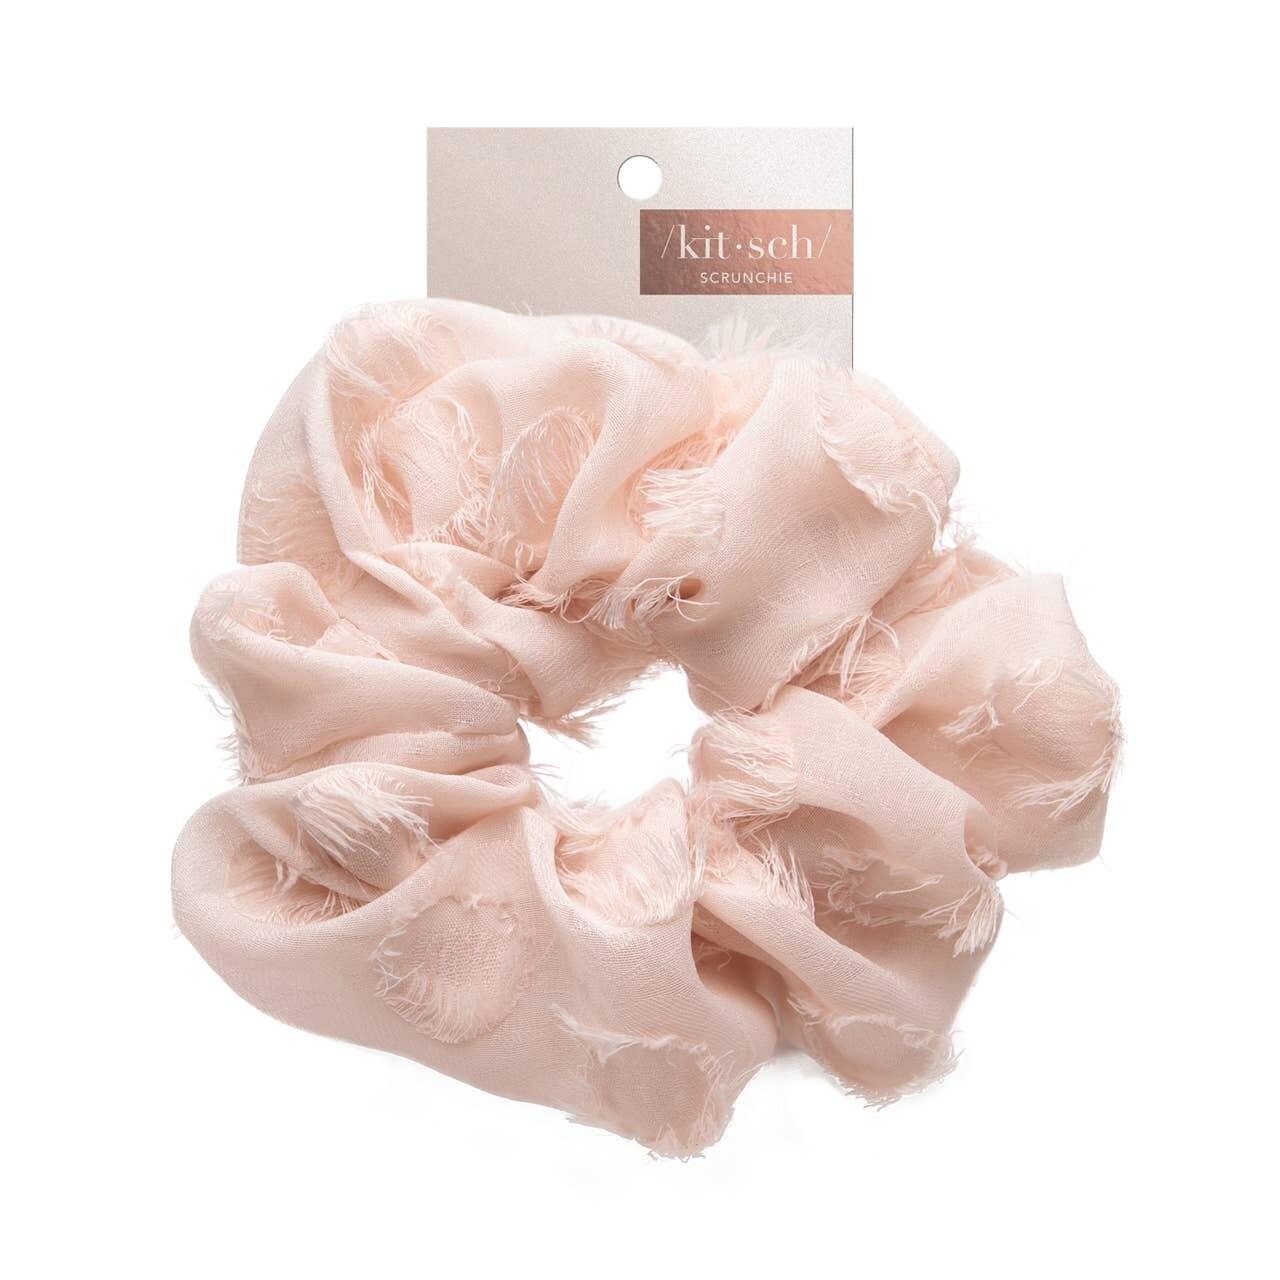 Brunch Scrunchie- Frayed Pink